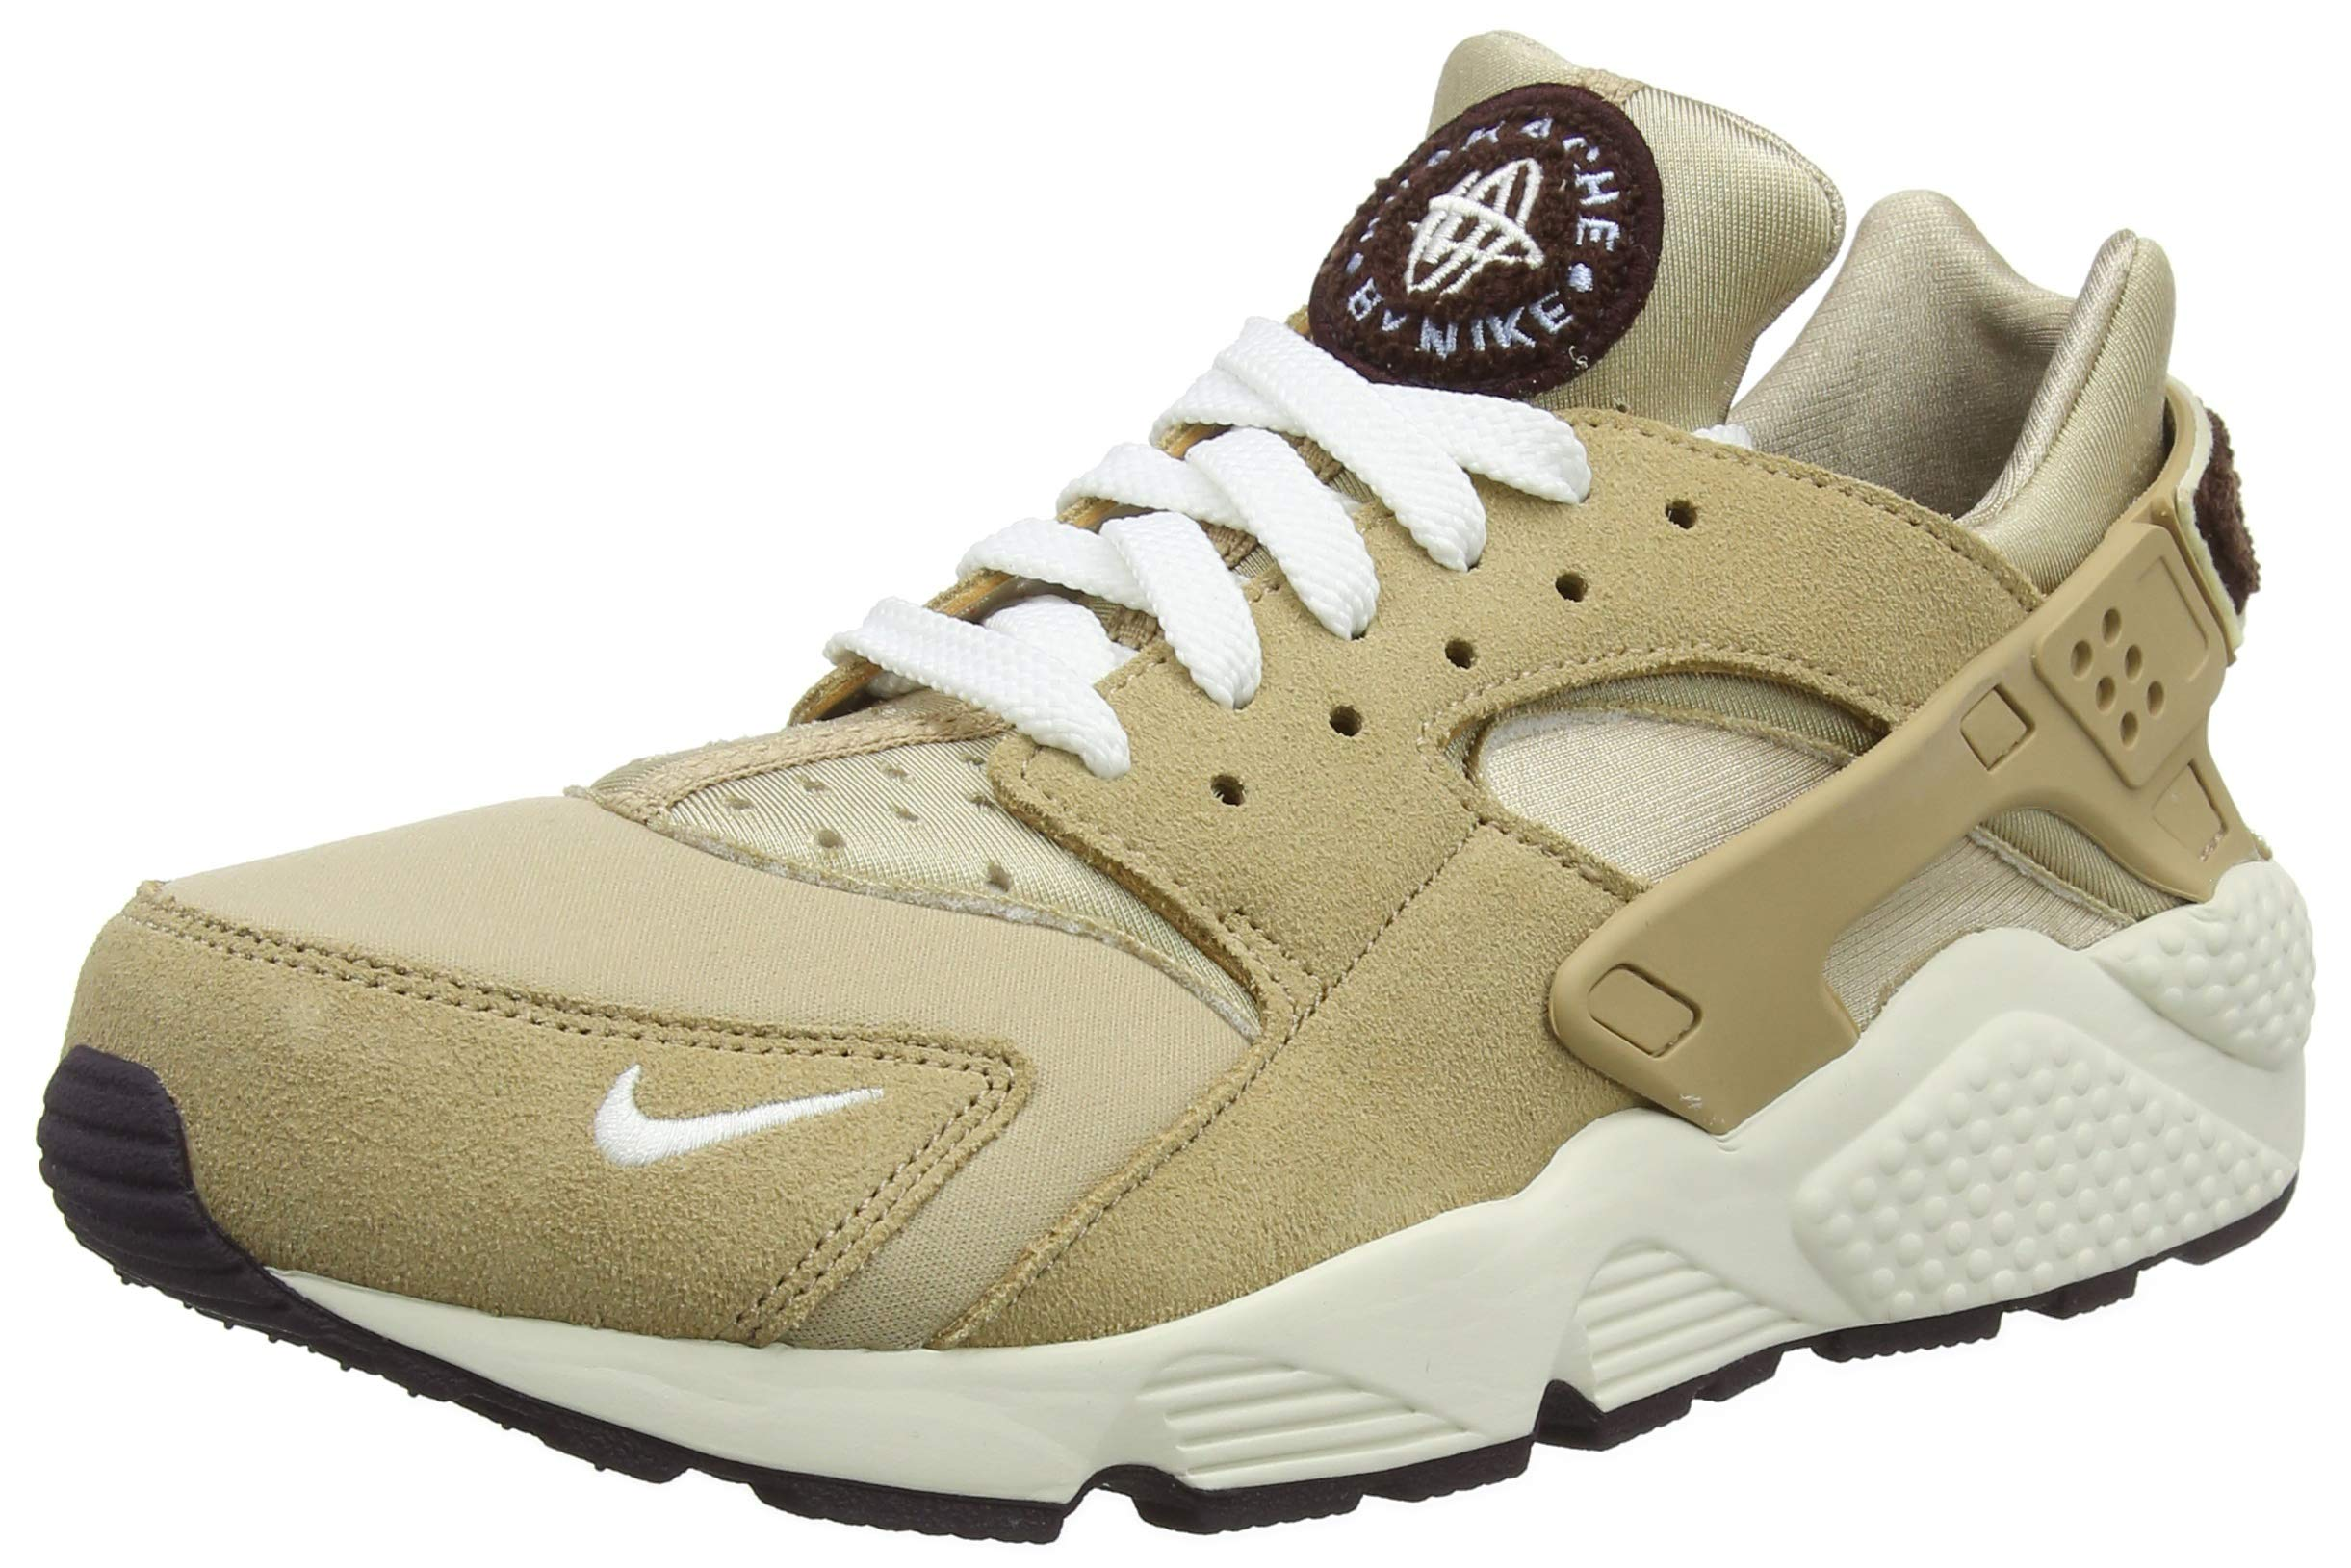 814OCBTJJJL - Nike Men's Air Huarache Run PRM Fitness Shoes